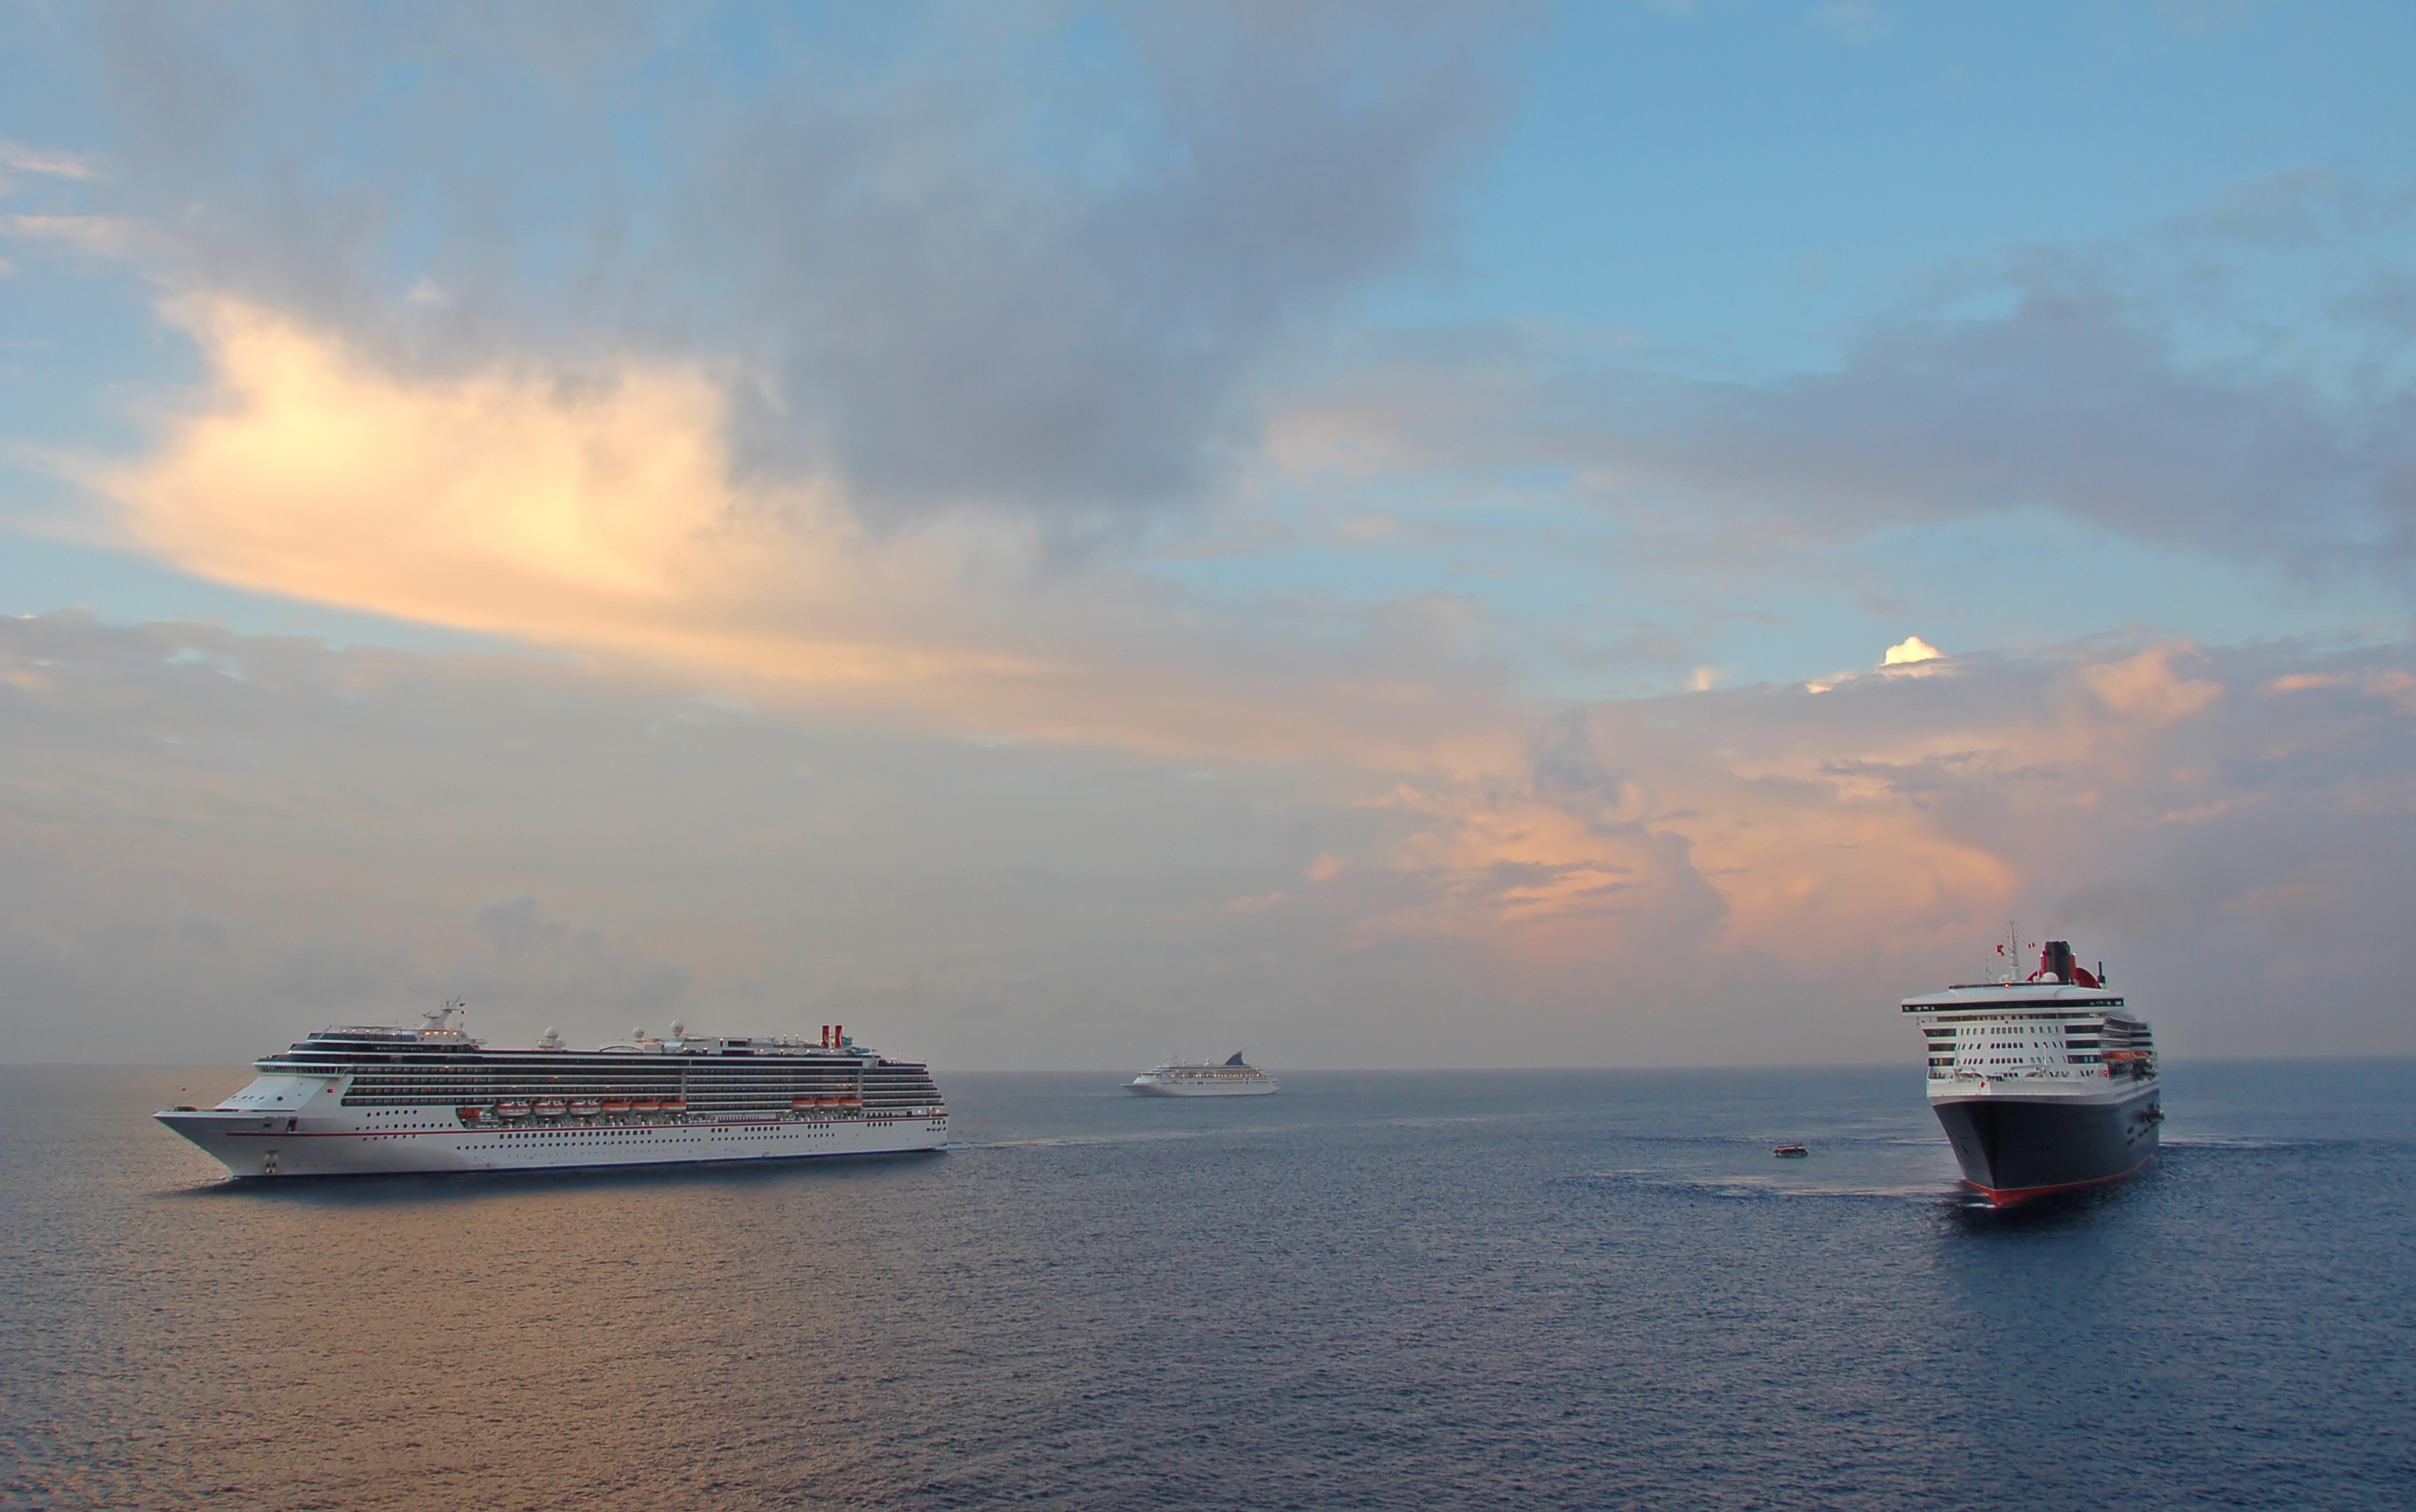 Panoramic view of three cruise ships at dawn